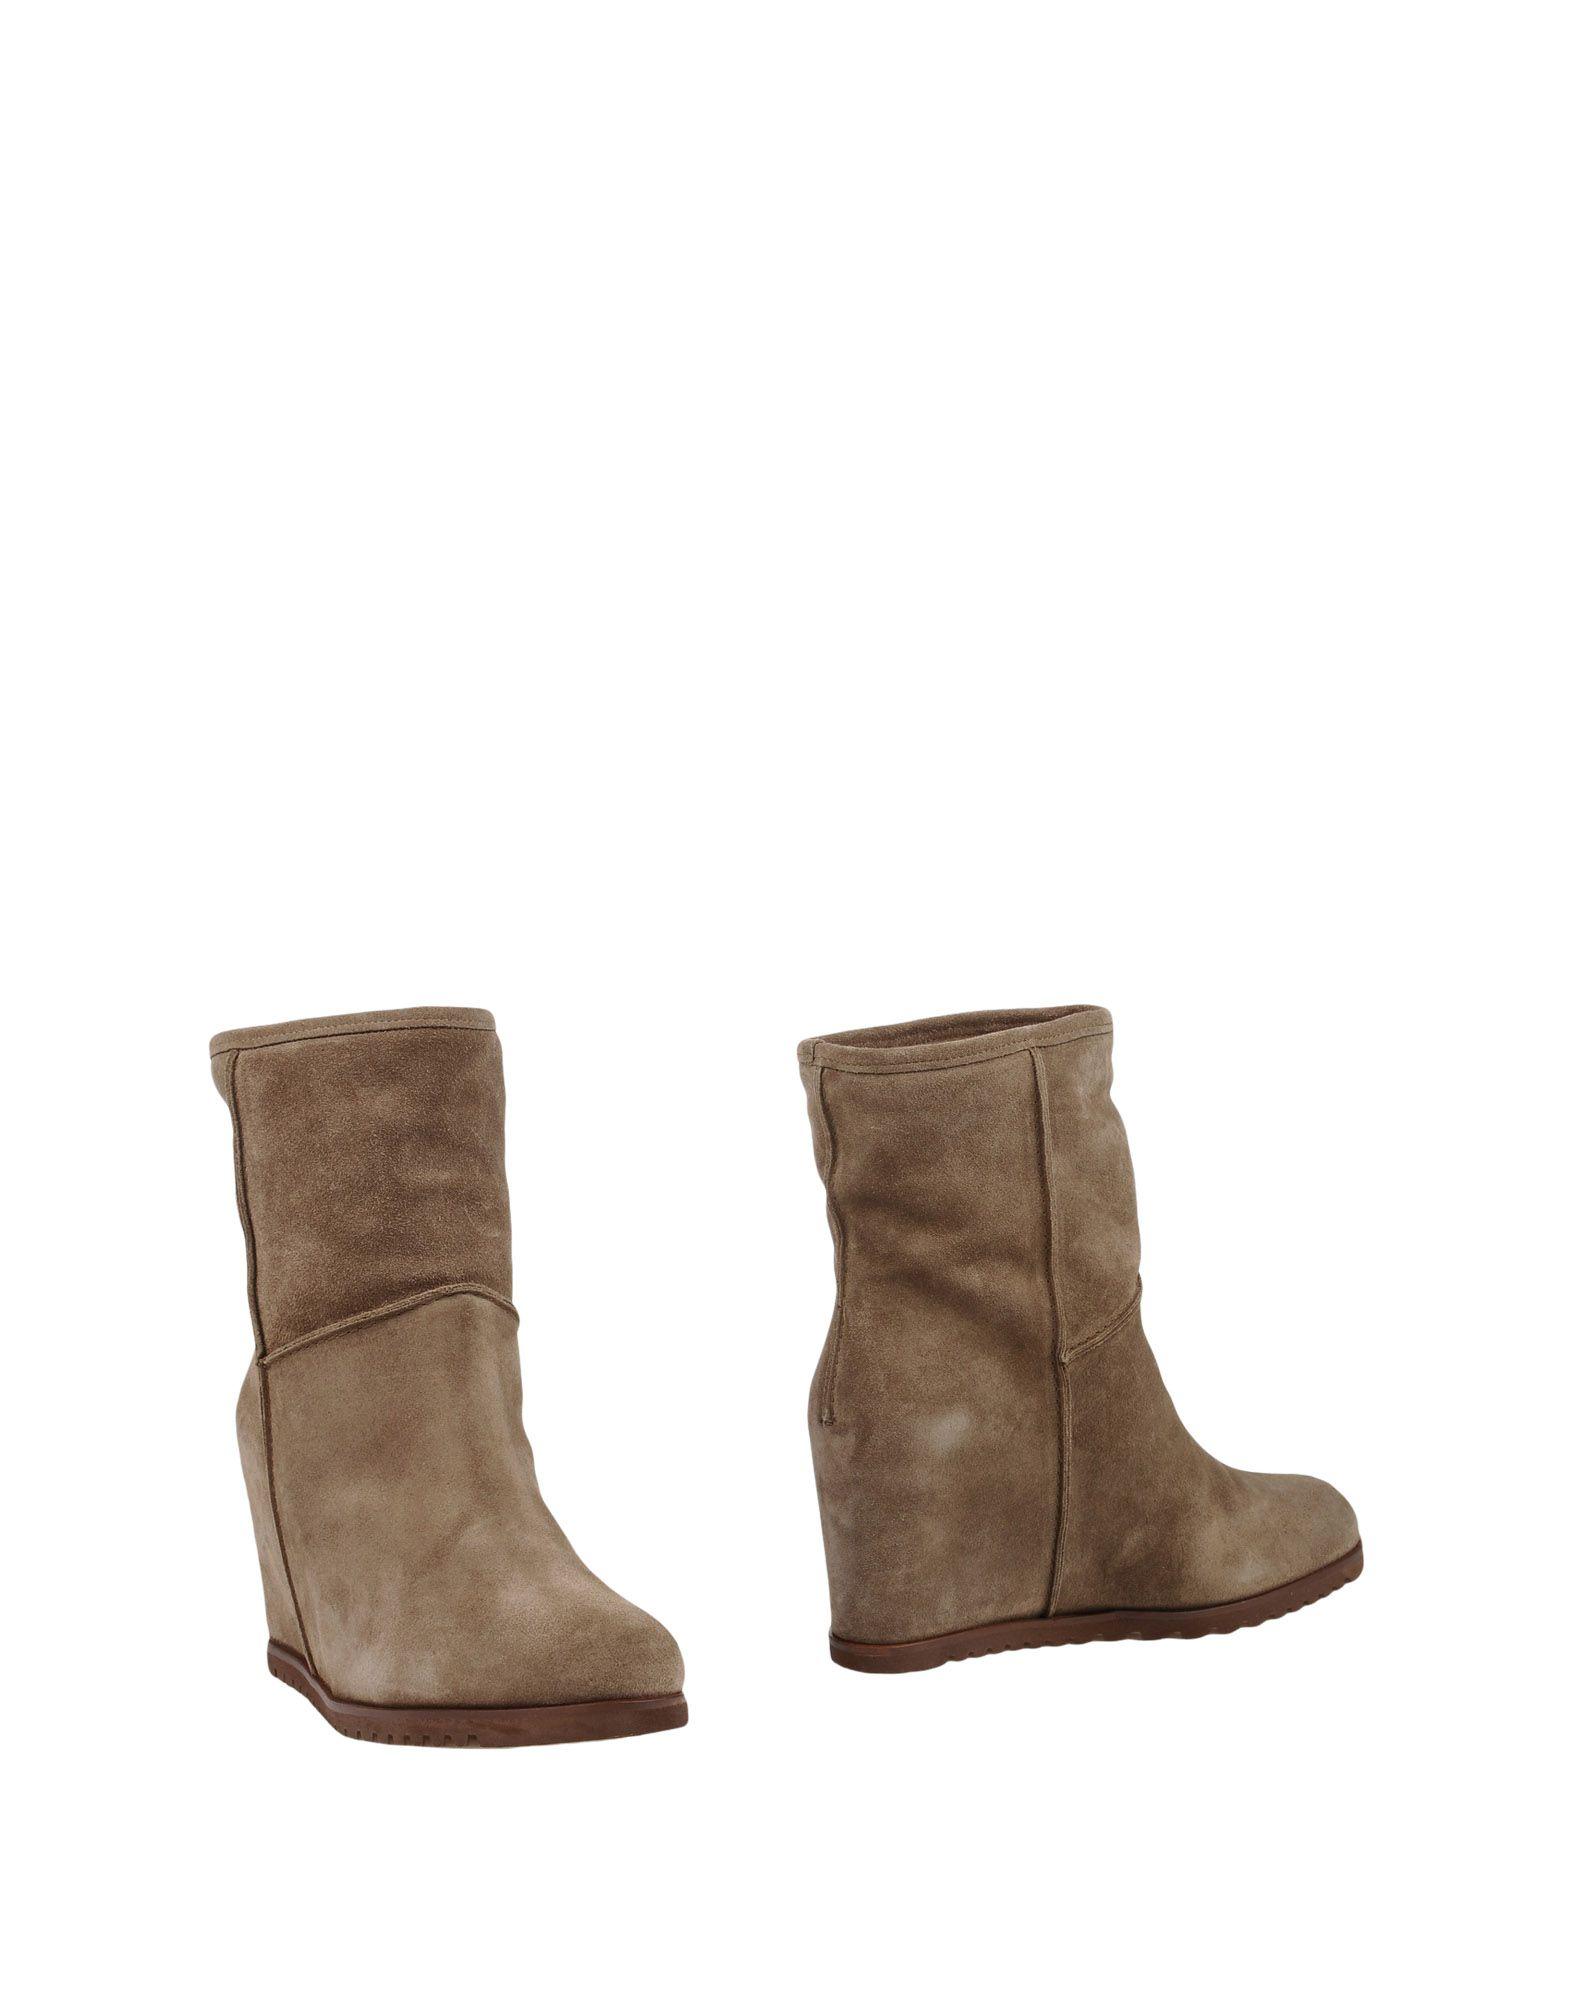 Fabio Rusconi Stiefelette Damen  11369390LA Gute Qualität beliebte Schuhe